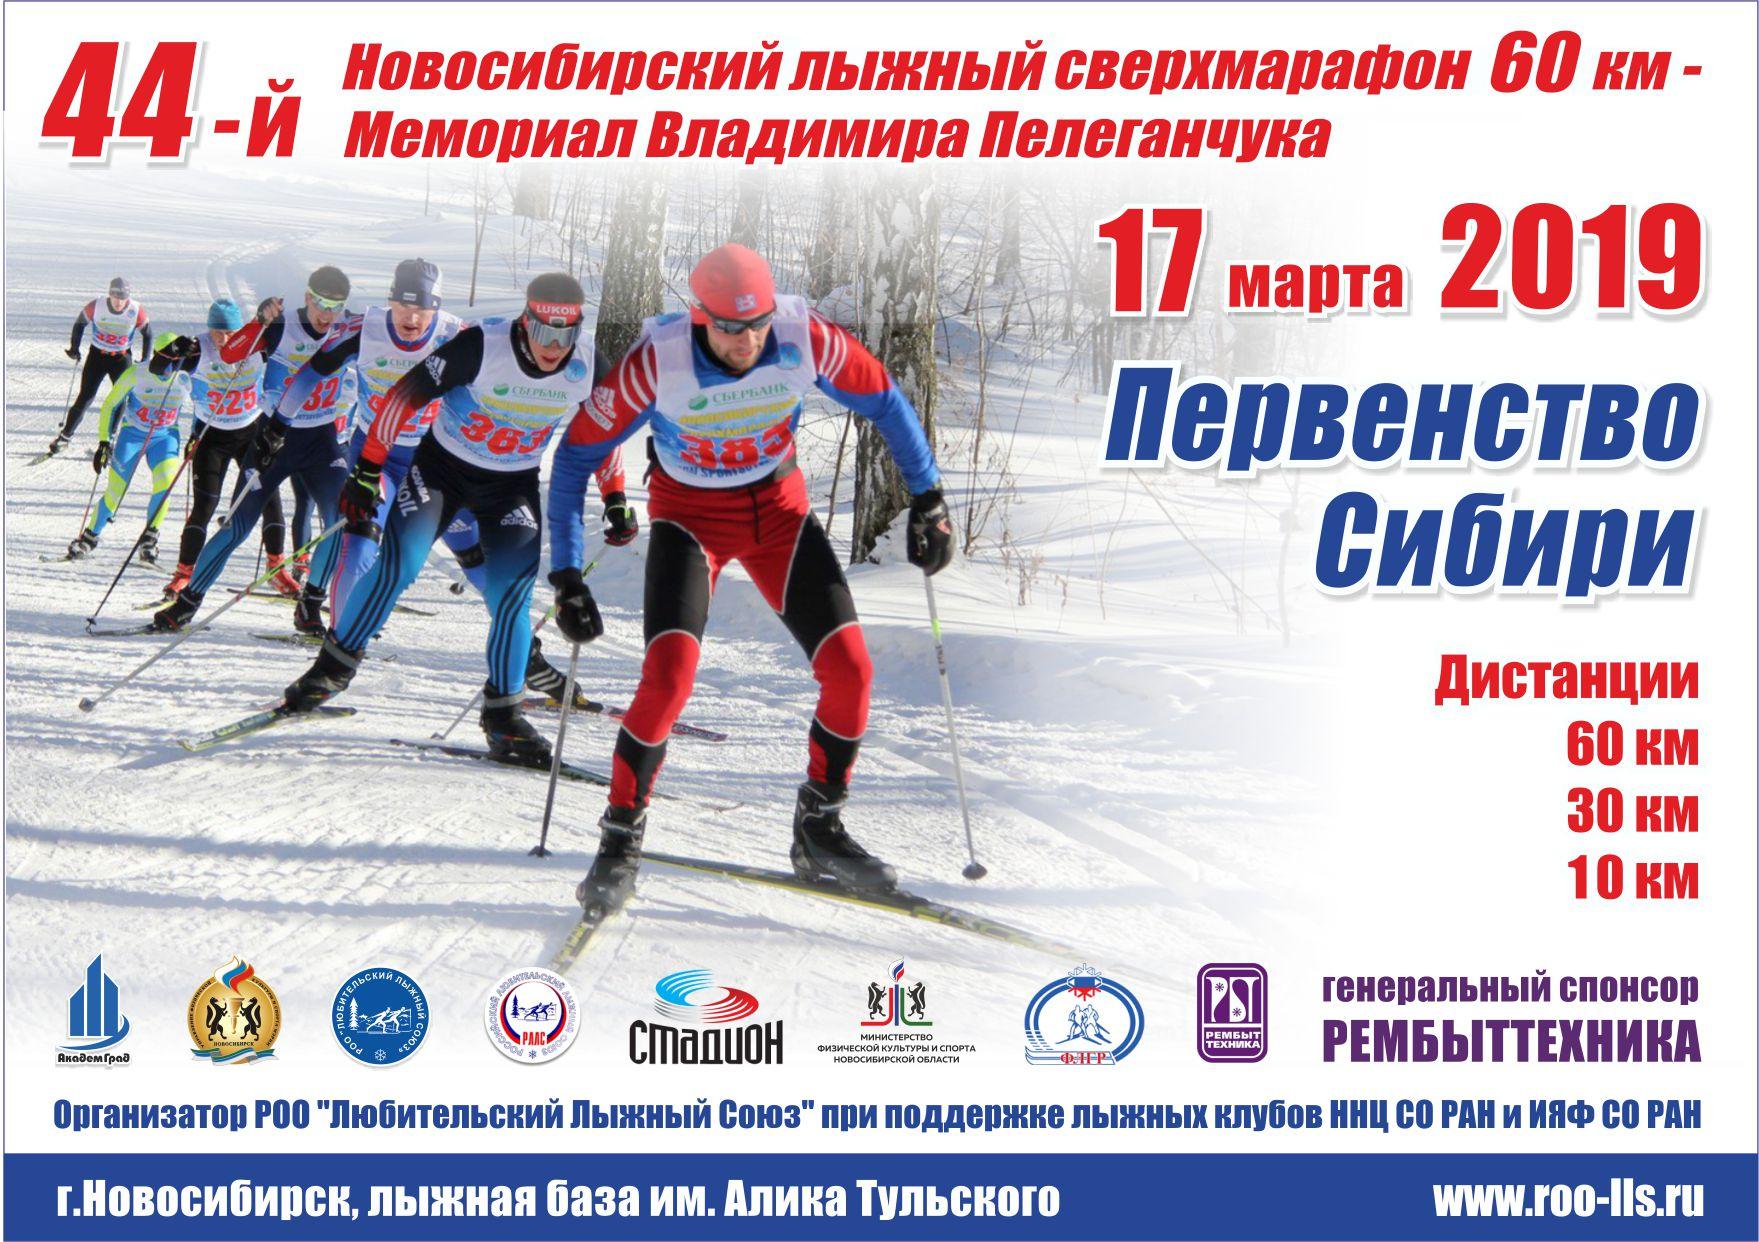 Регистрация на СВЕРХМАРАФОН Пелеганчука